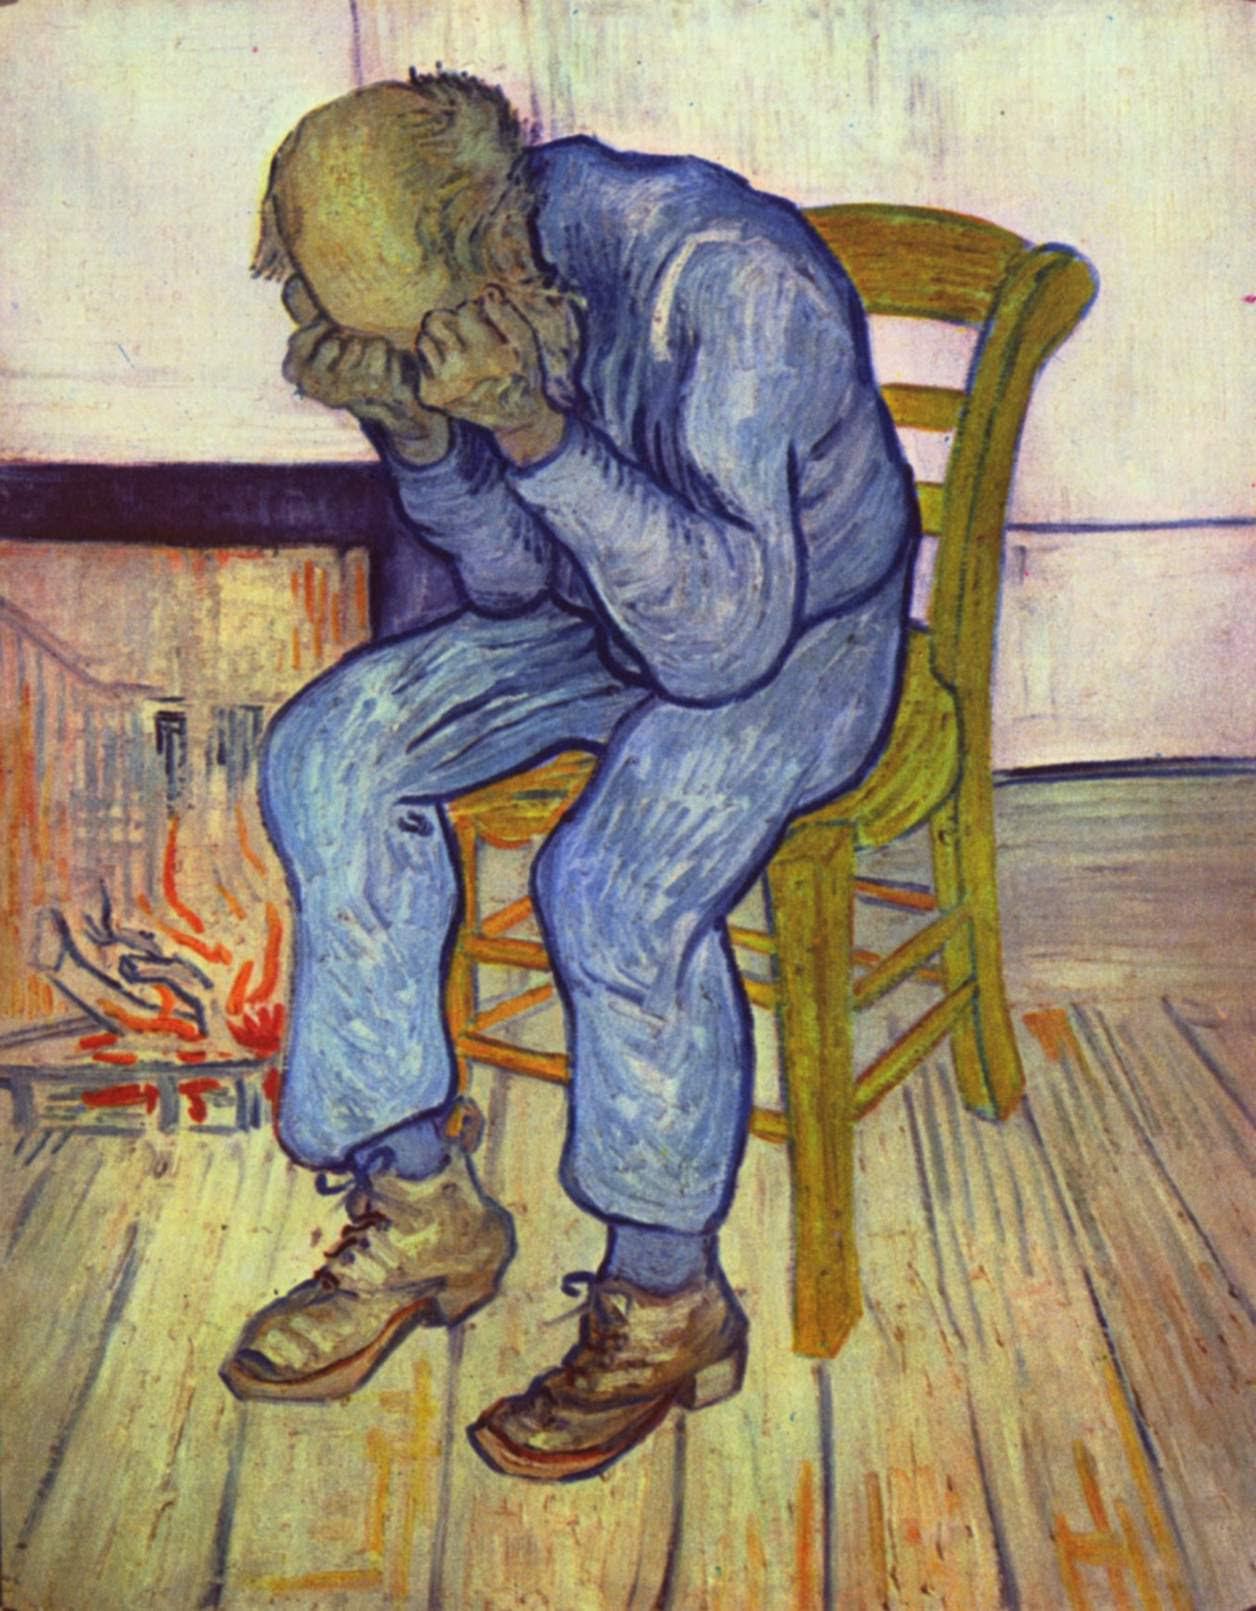 http://upload.wikimedia.org/wikipedia/commons/3/38/Vincent_Willem_van_Gogh_002.jpg